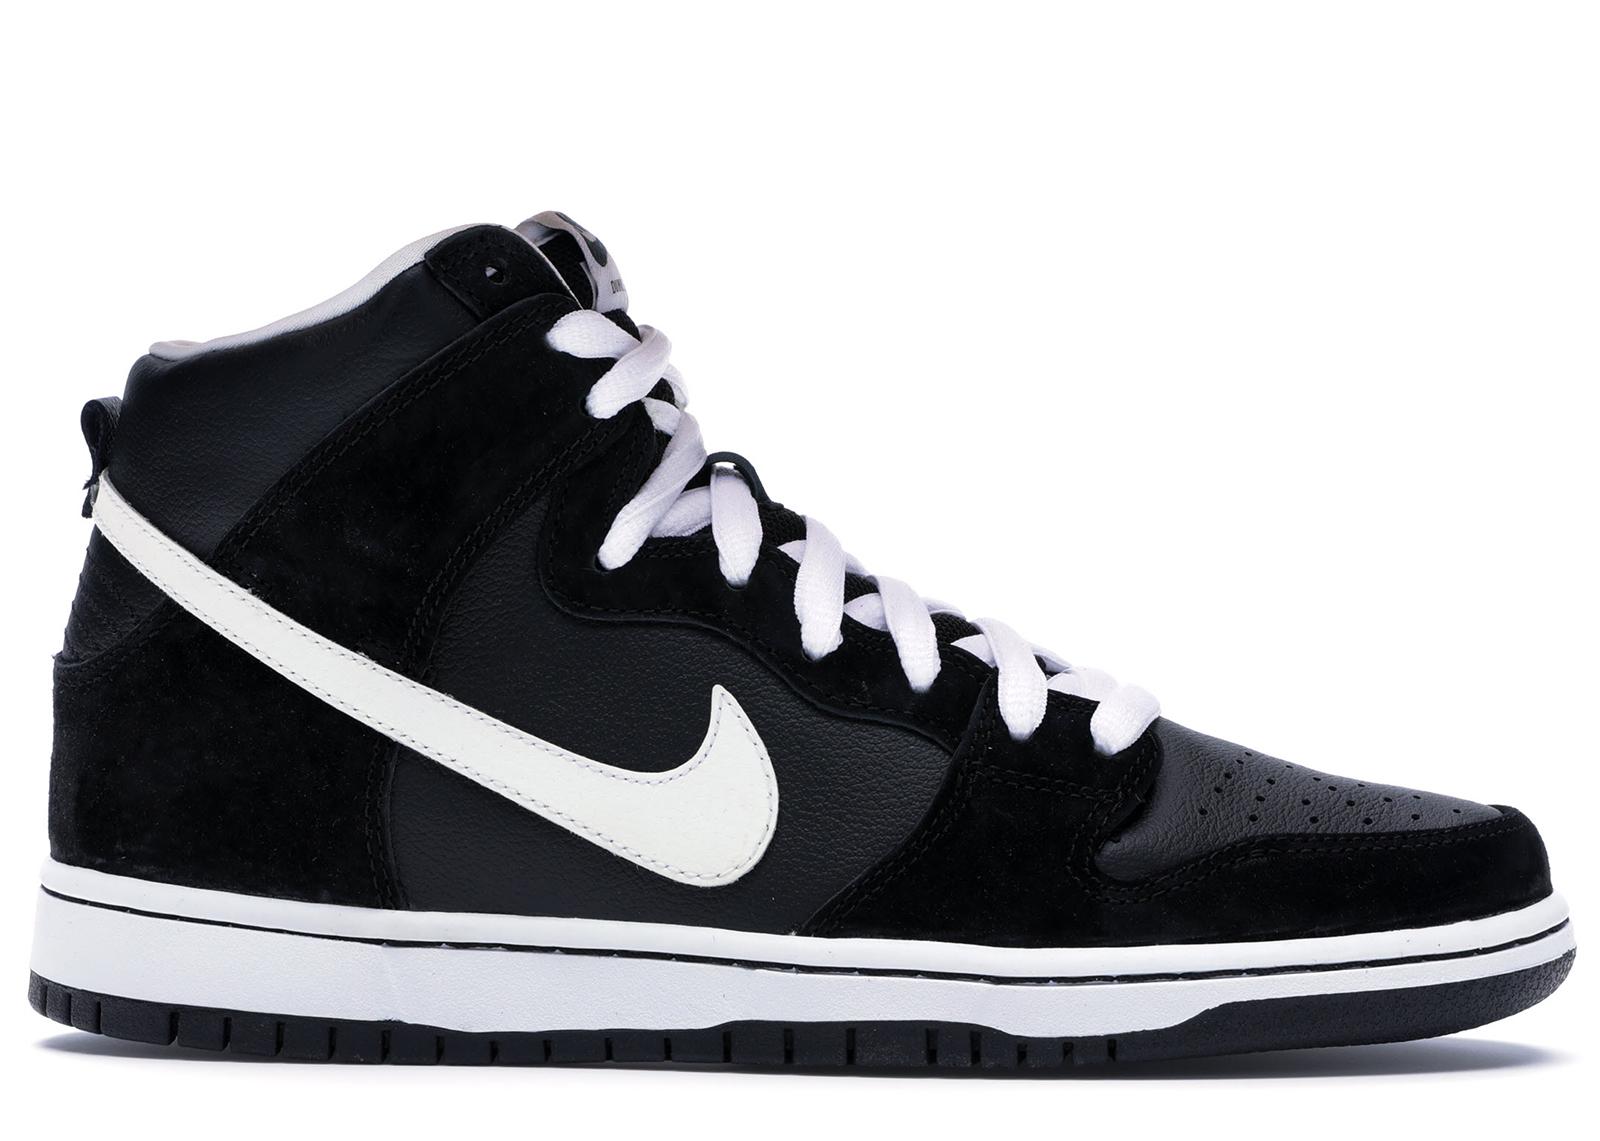 Nike Dunk SB High Venom Black